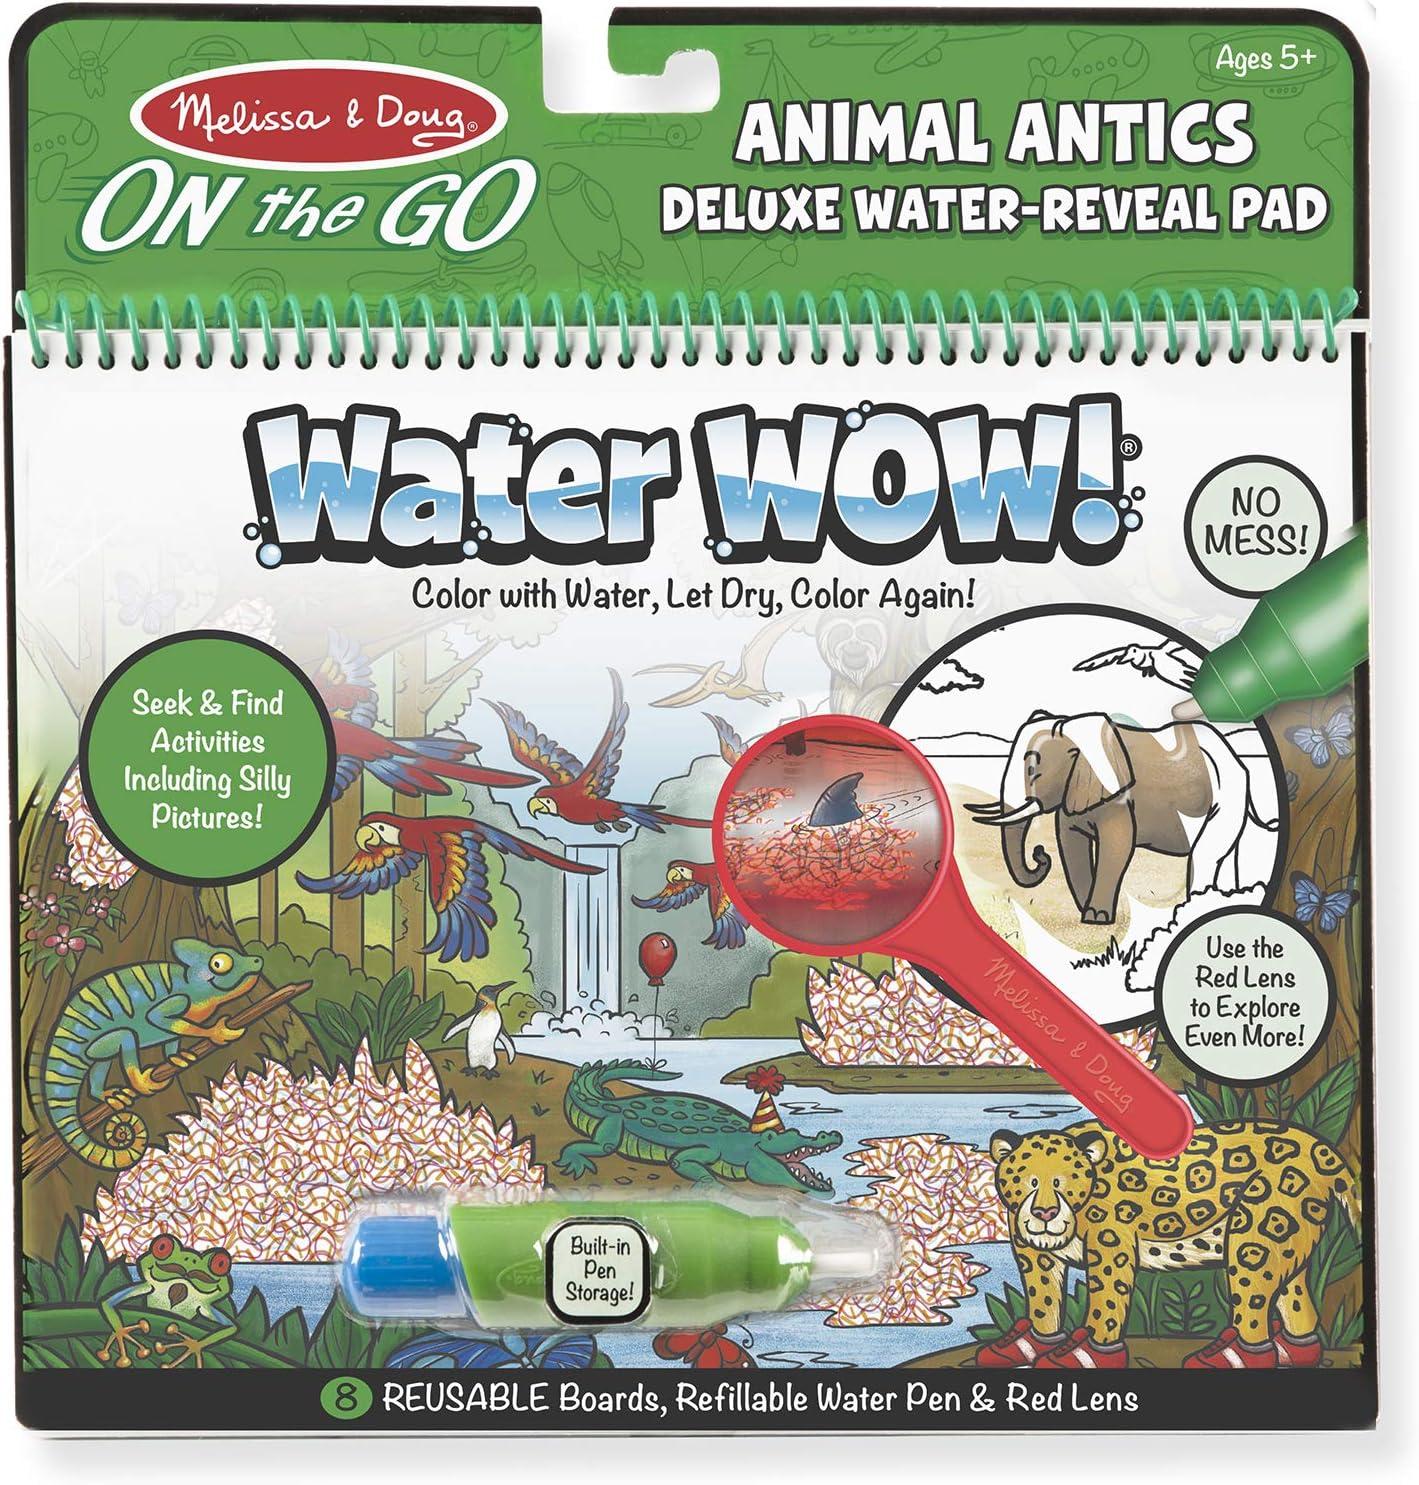 Melissa & Doug On the Go Water Wow! Reusable Water-Reveal Deluxe Activity Pad – Animal Antics